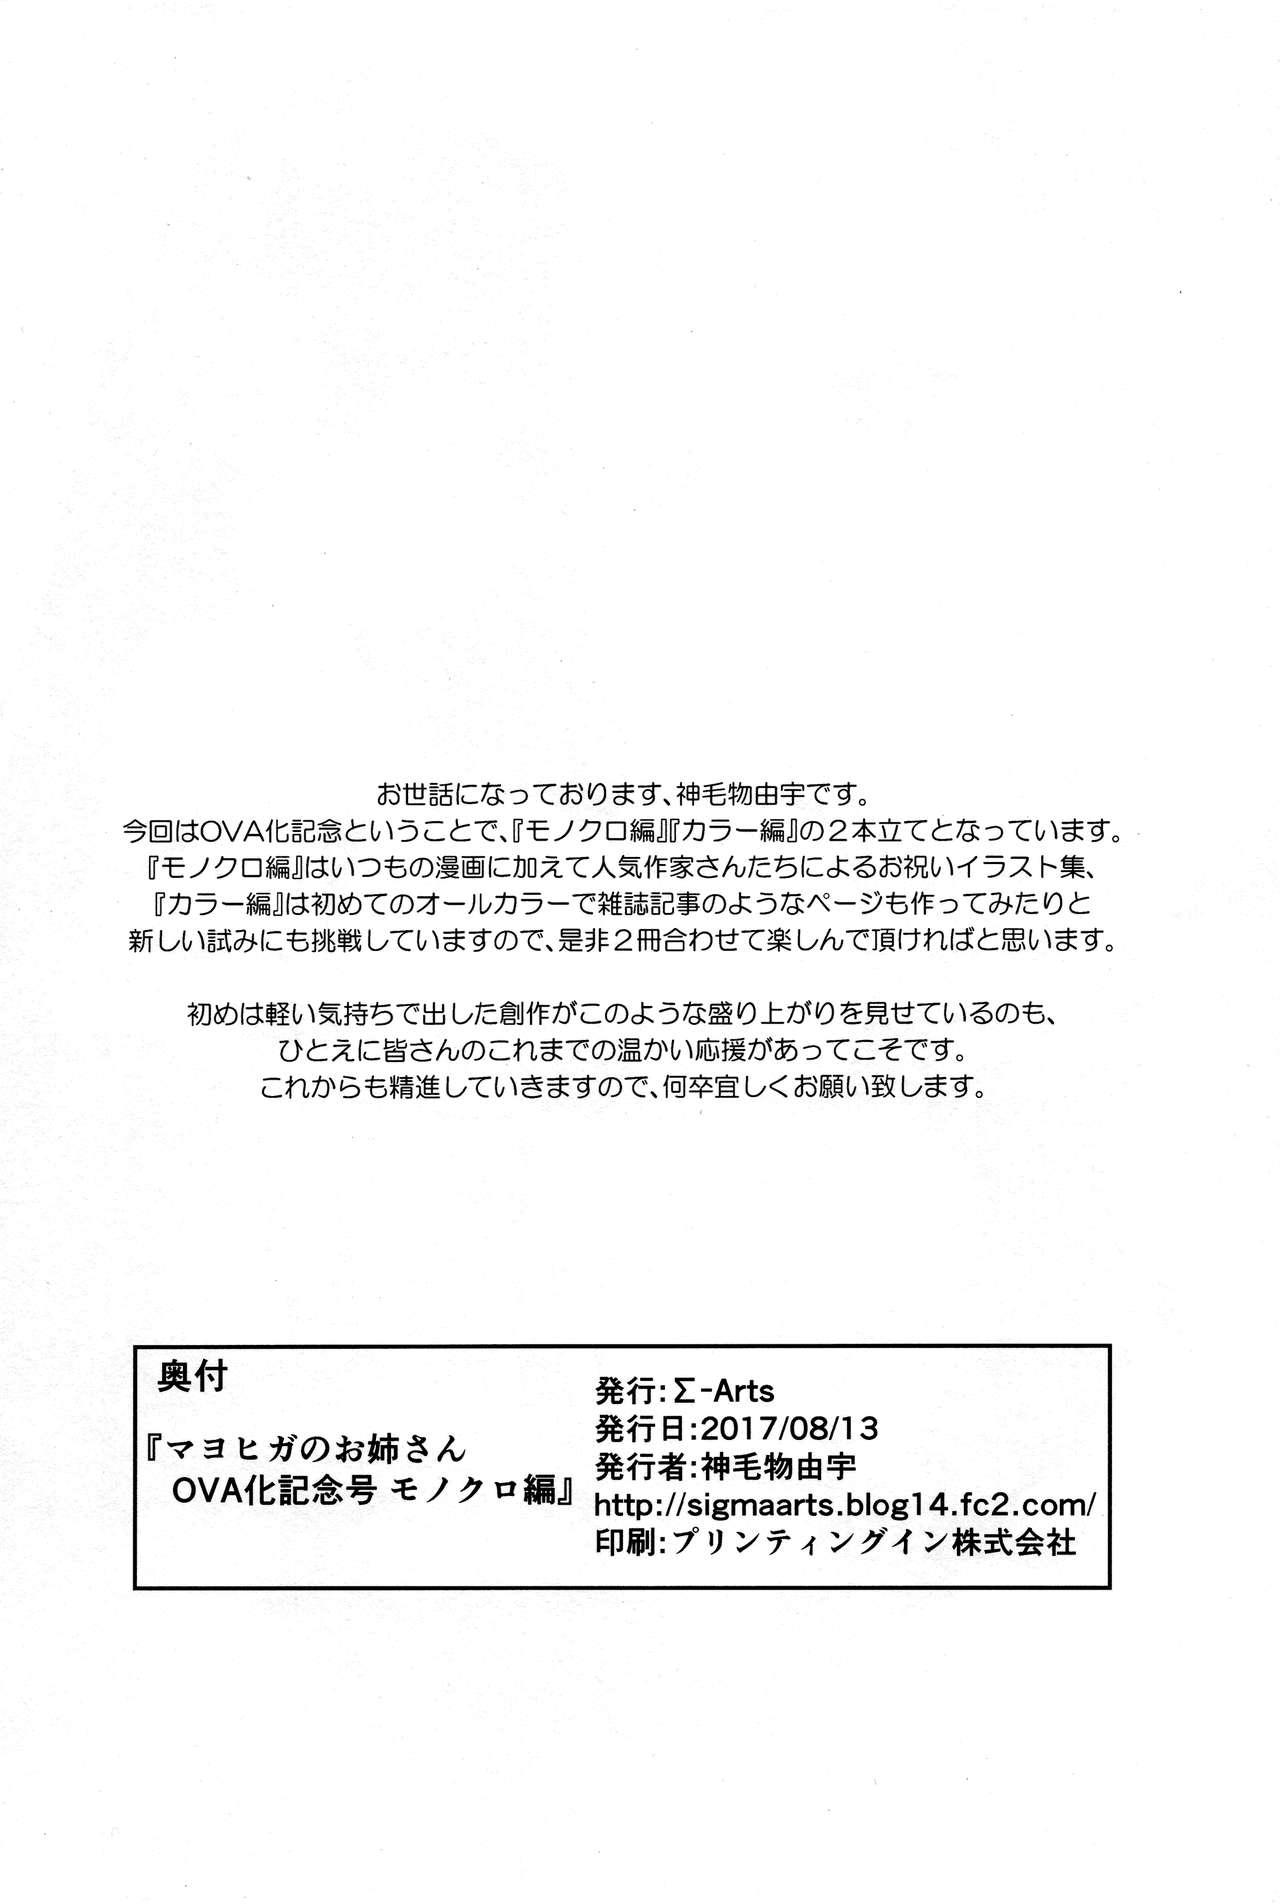 (C92) [Σ-Arts (Mikemono Yuu)] Mayoiga no Onee-san OVA-ka Kinengou Monochro Hen [English] [Clawhammer] 20